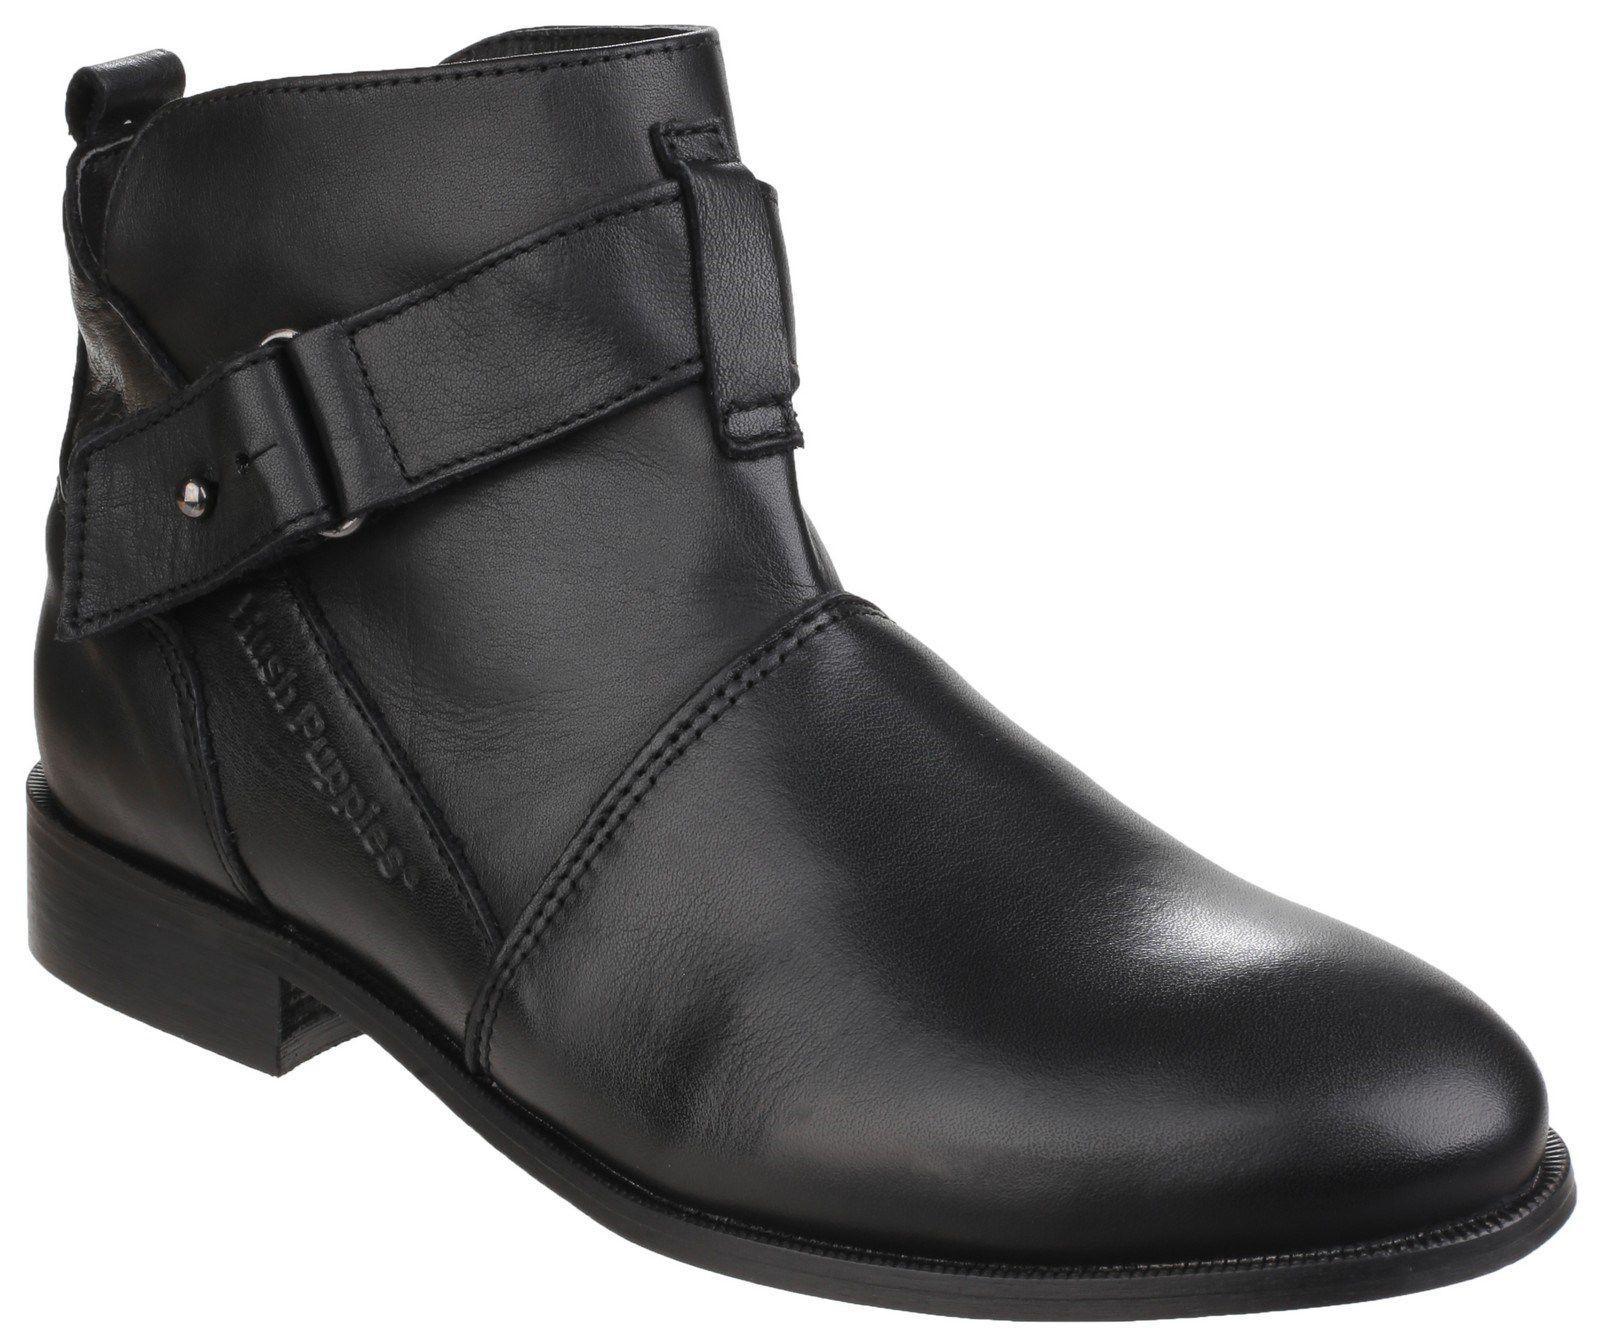 929969230fb3 Hush Puppies Vita Pull On Boots in Black - Save 36% - Lyst